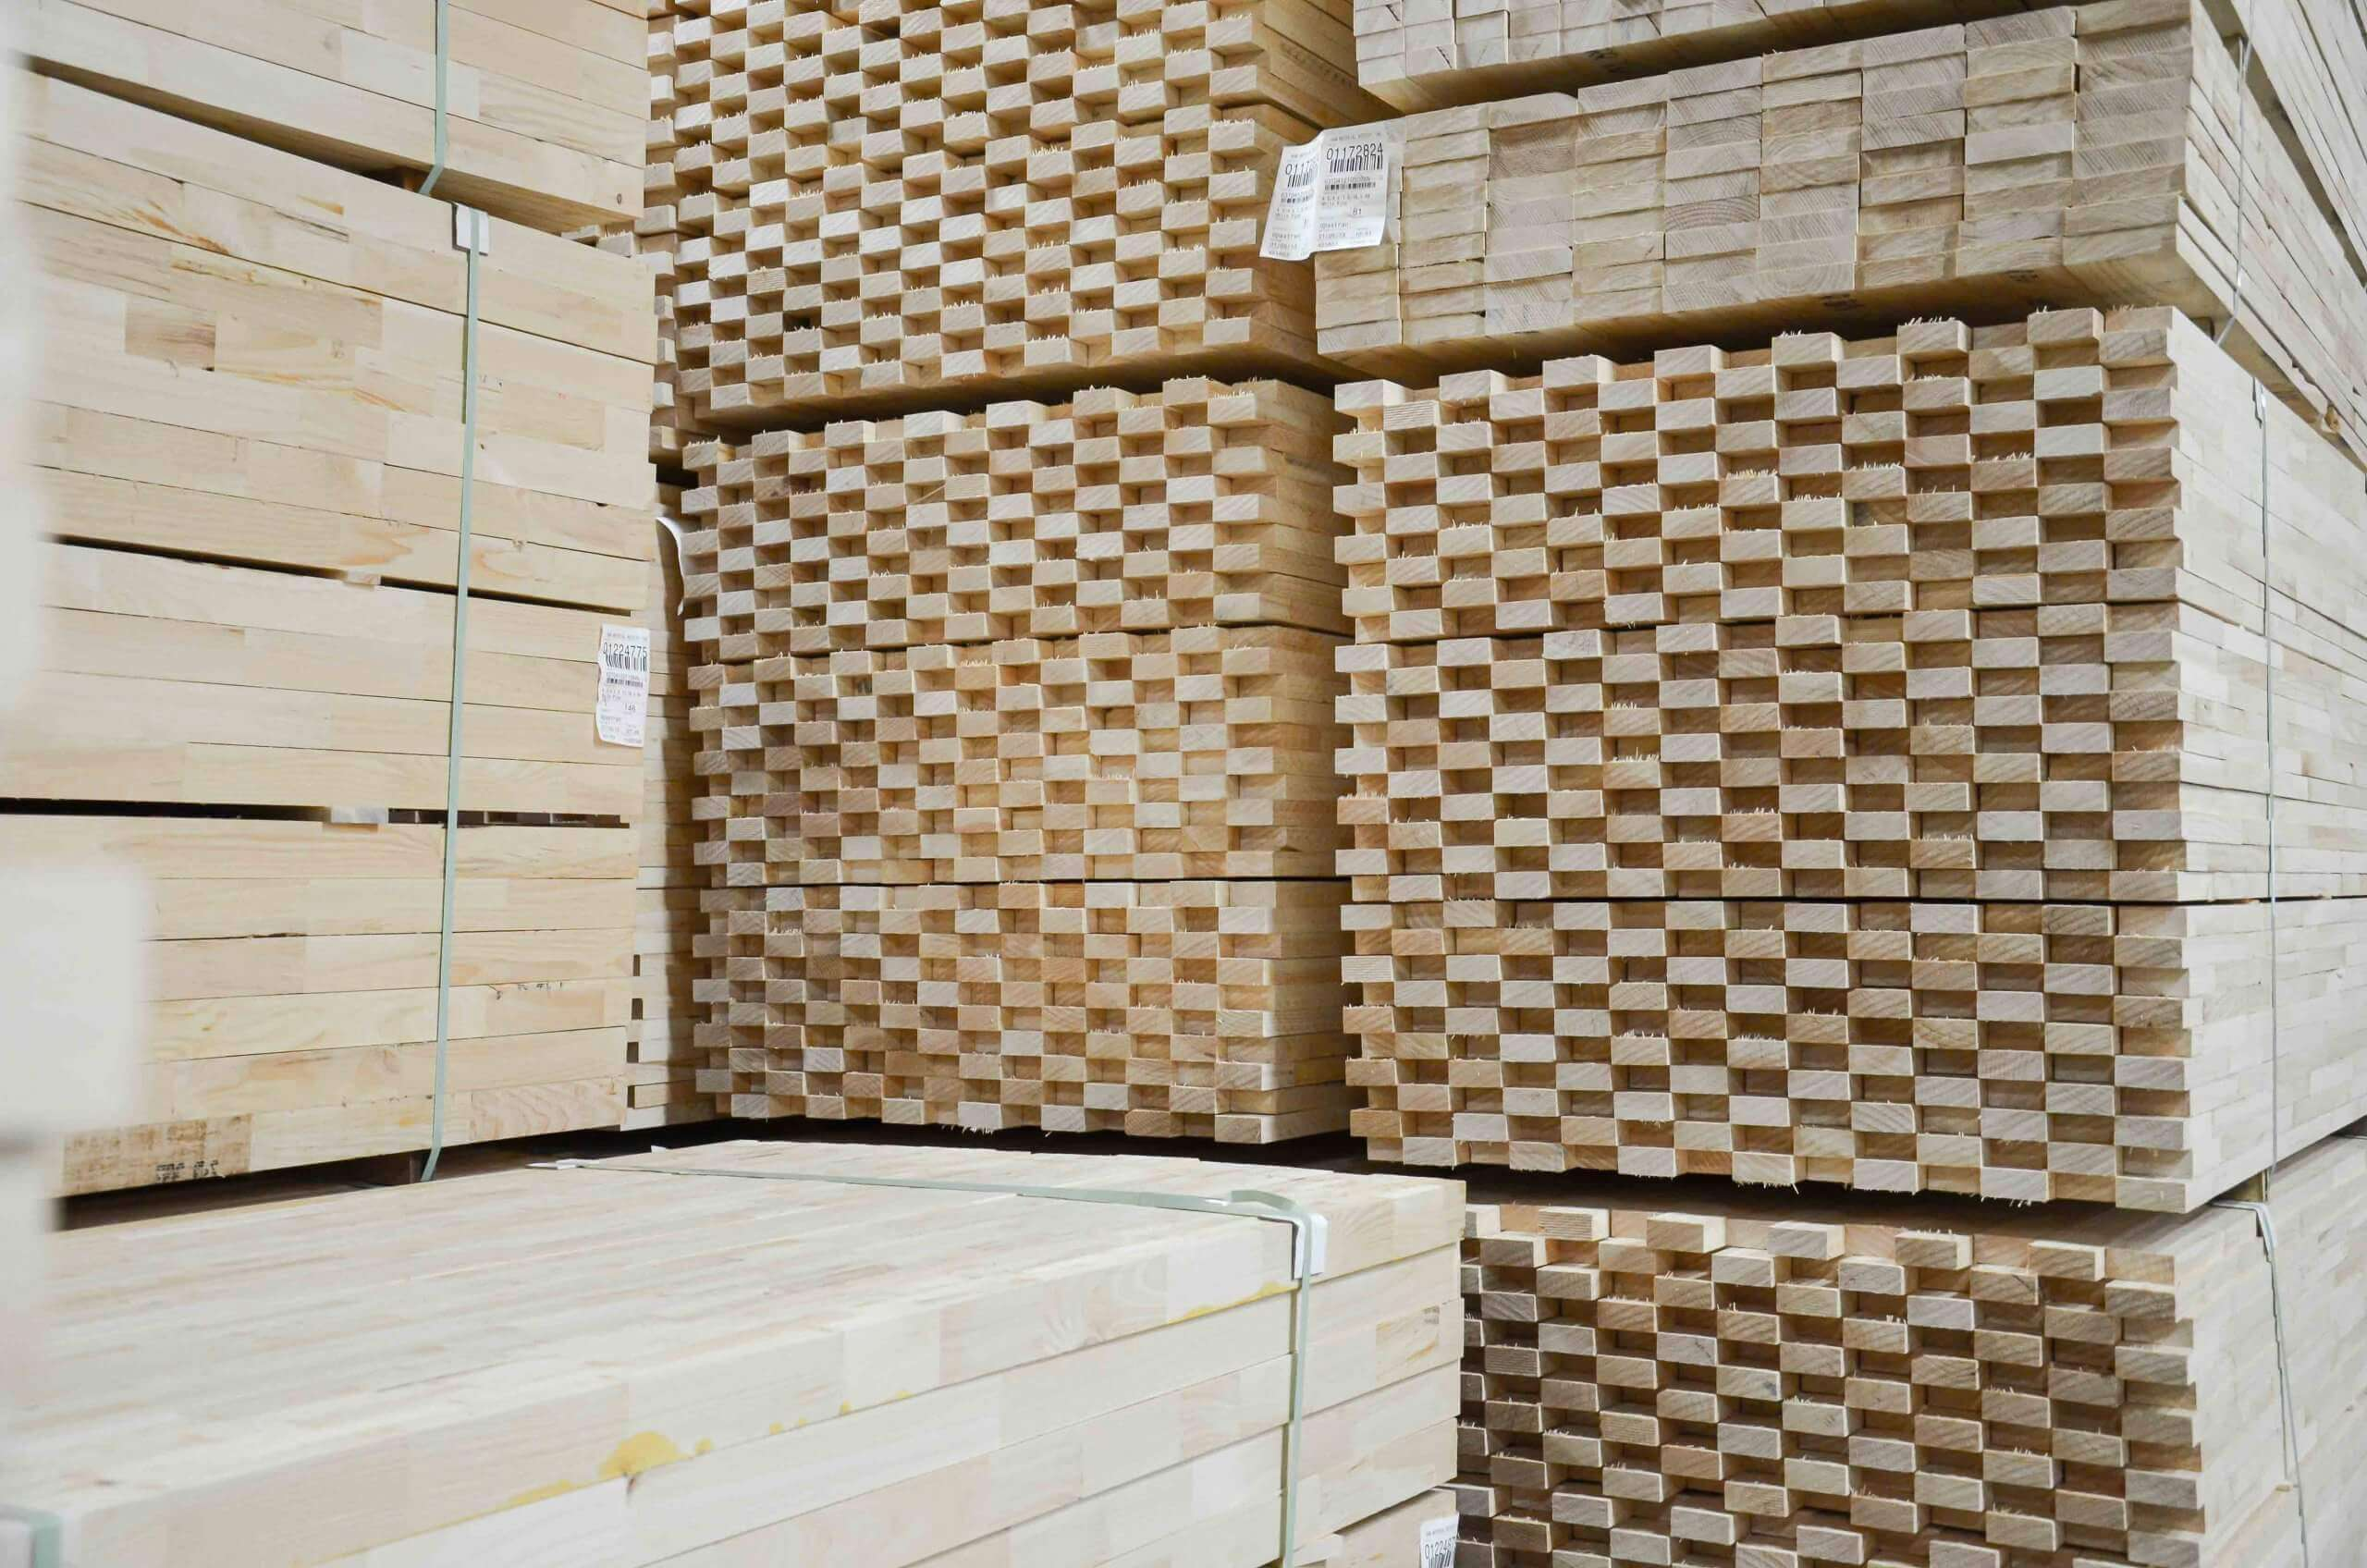 Stacks of wood cuttings